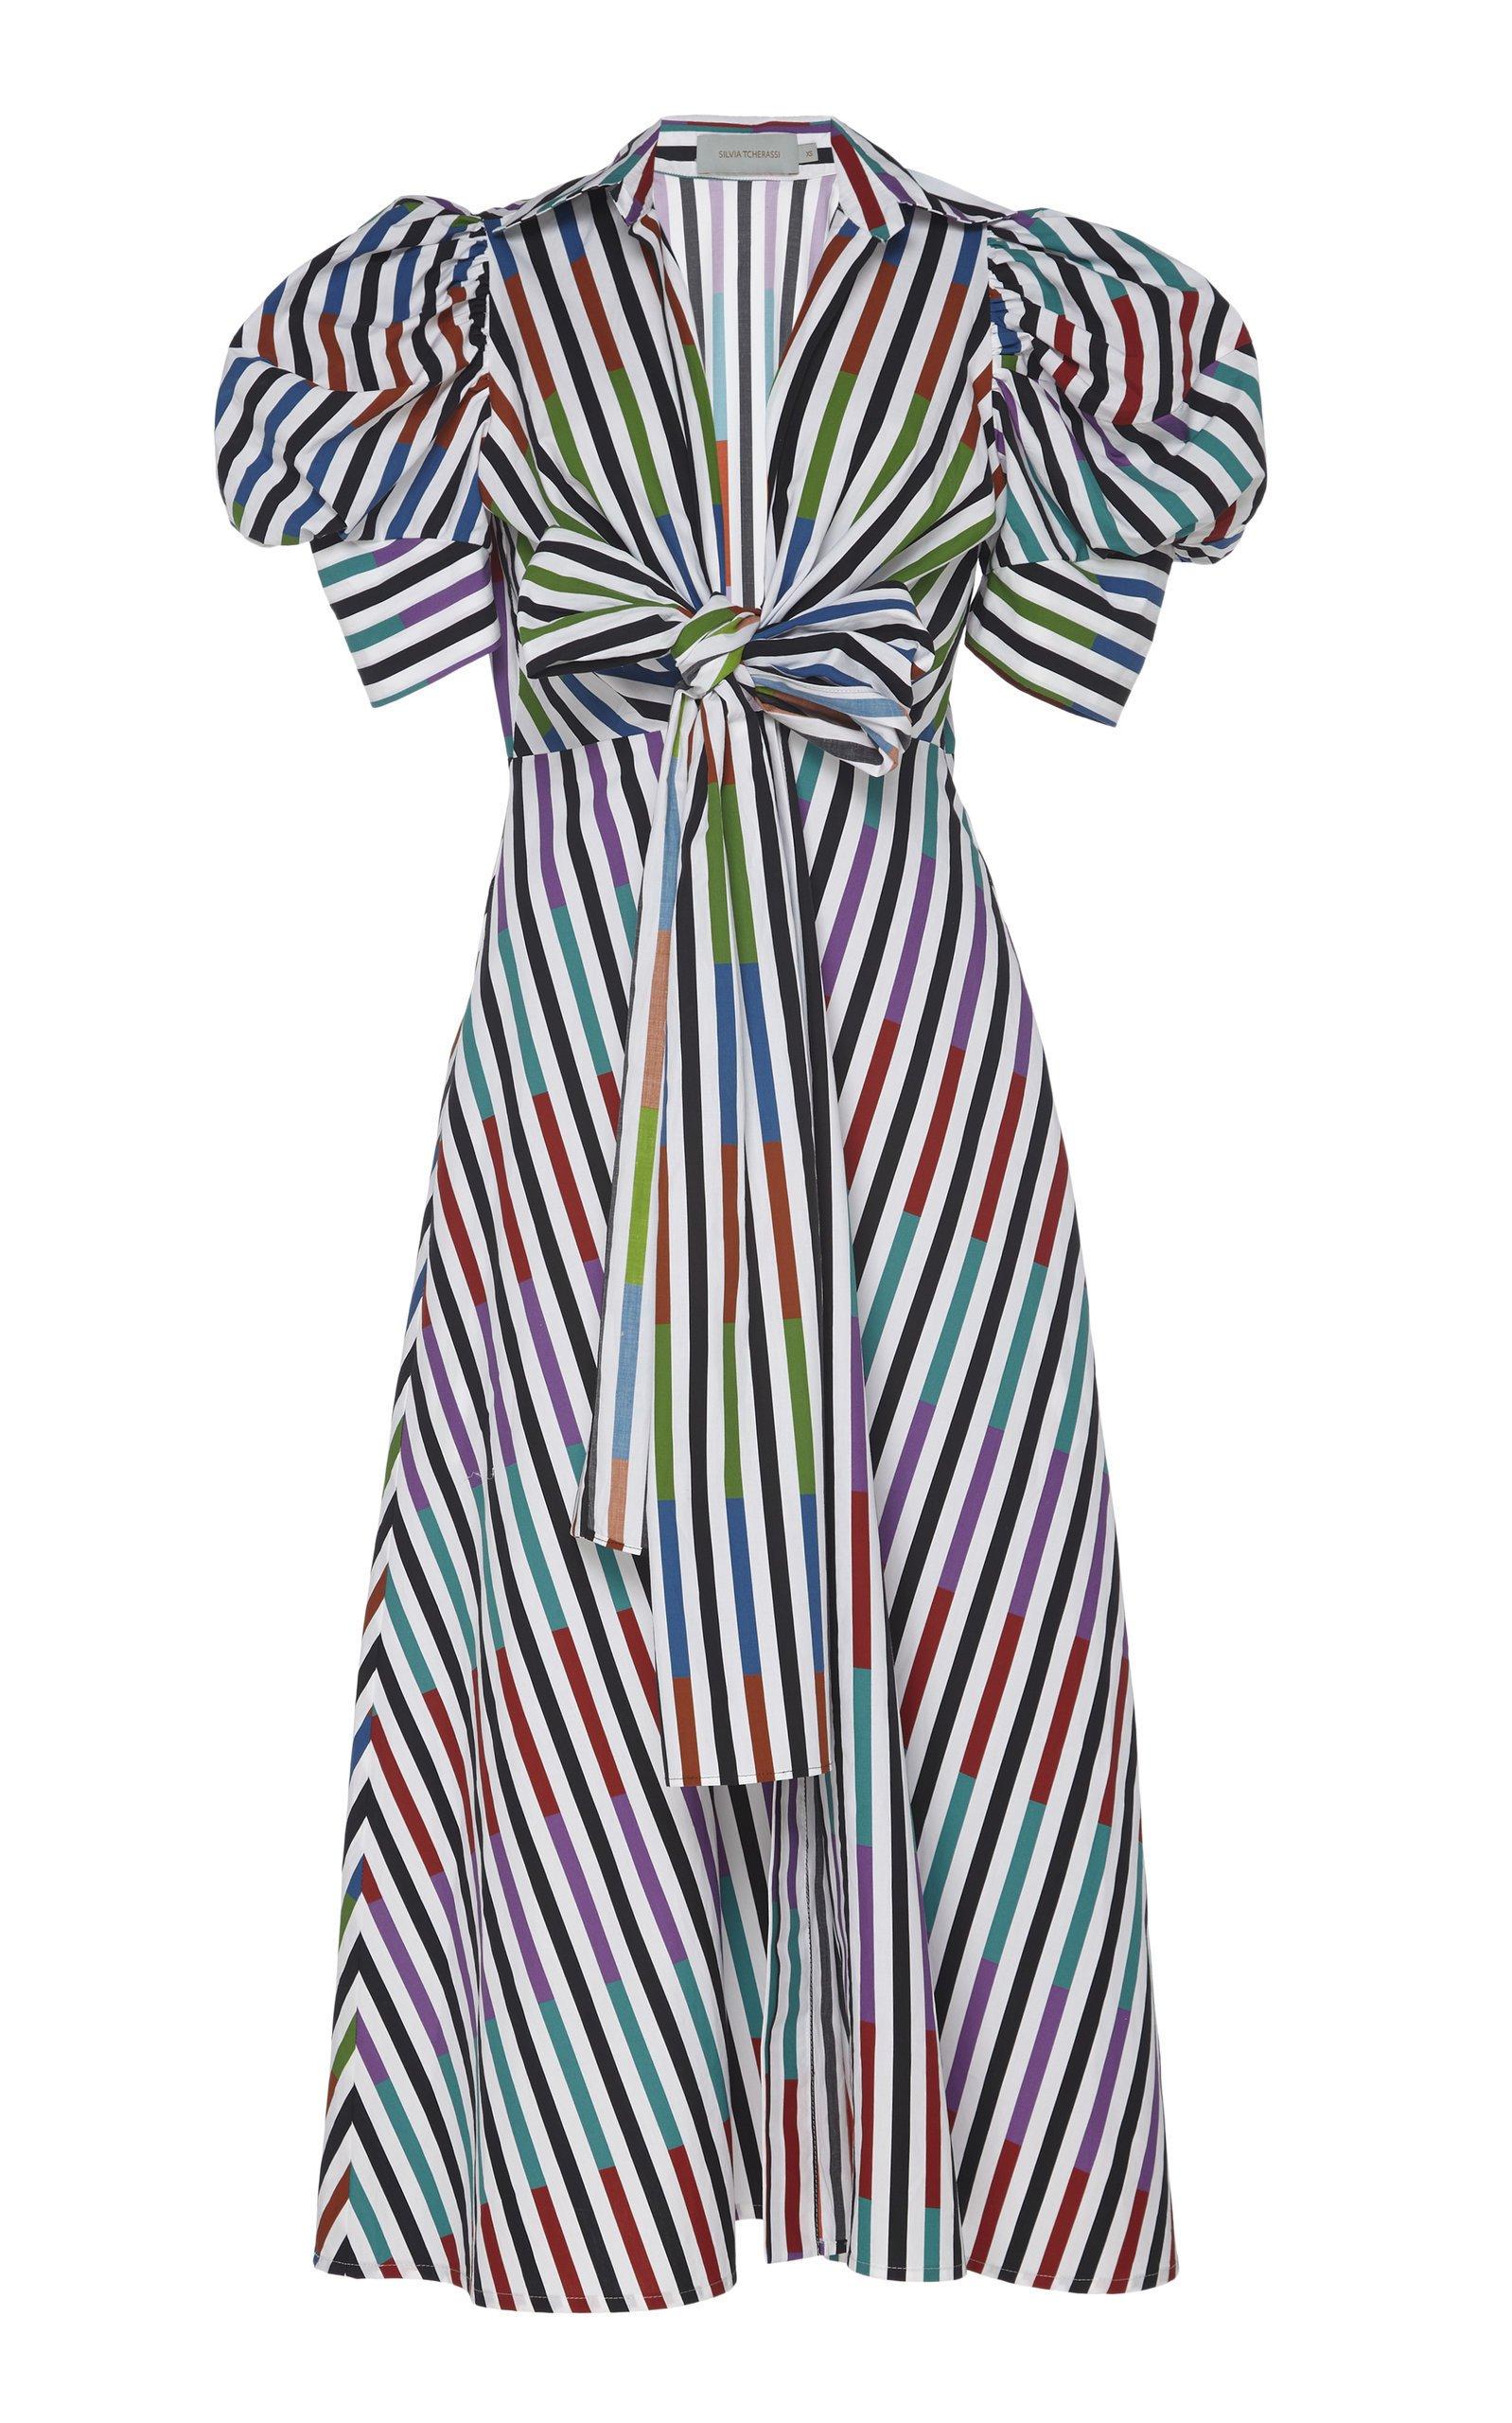 Silvia Tcherassi Cienaguera Cotton Dress Size: S